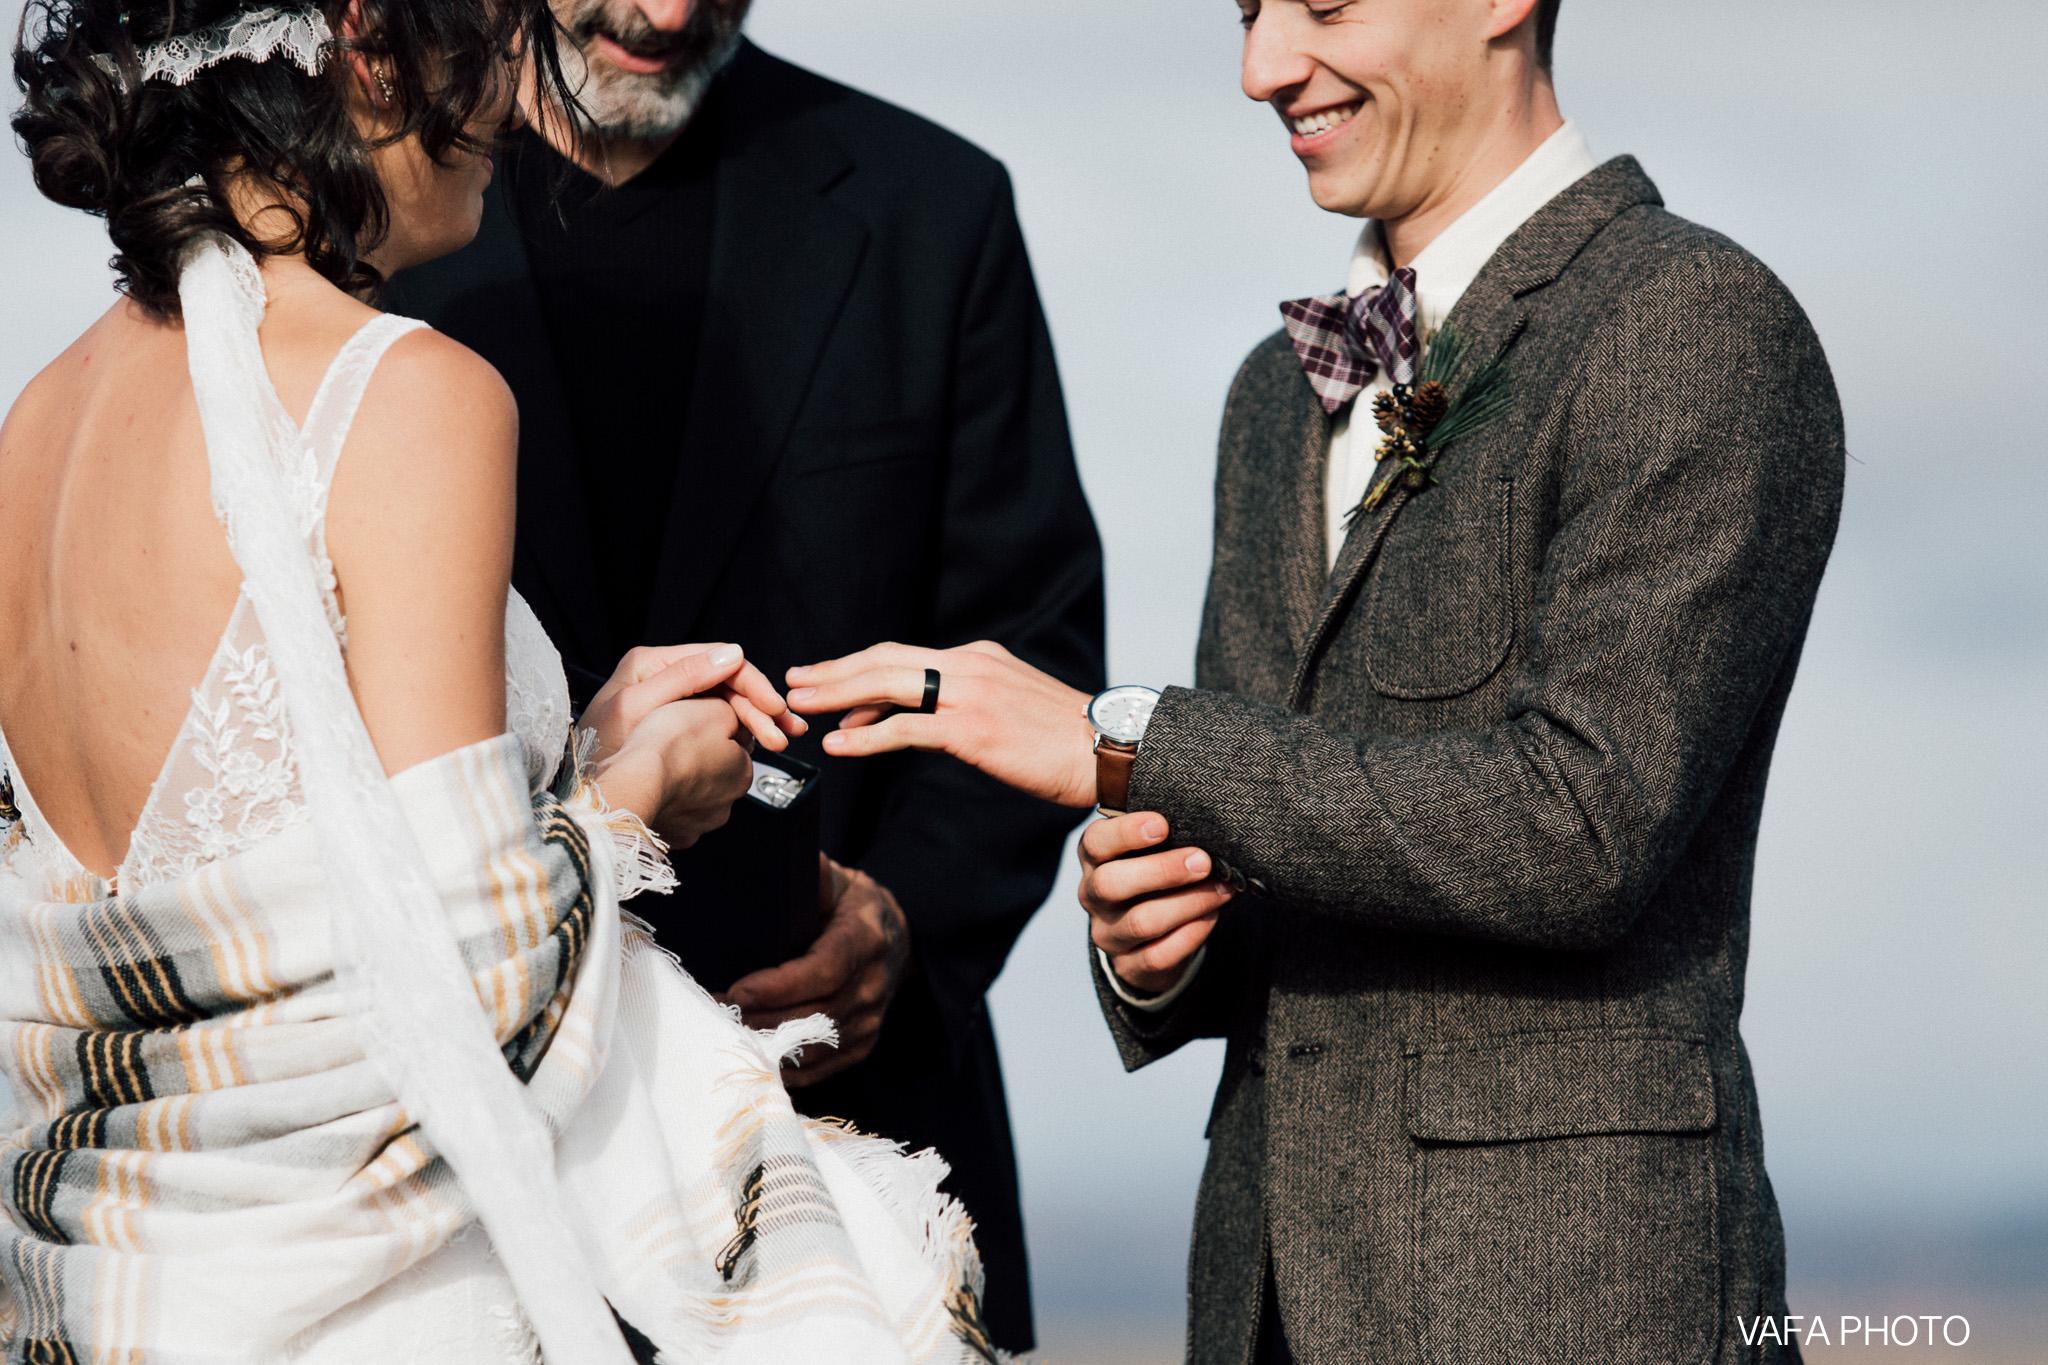 Hogback-Mountain-Wedding-Chelsea-Josh-Vafa-Photo-239.jpg